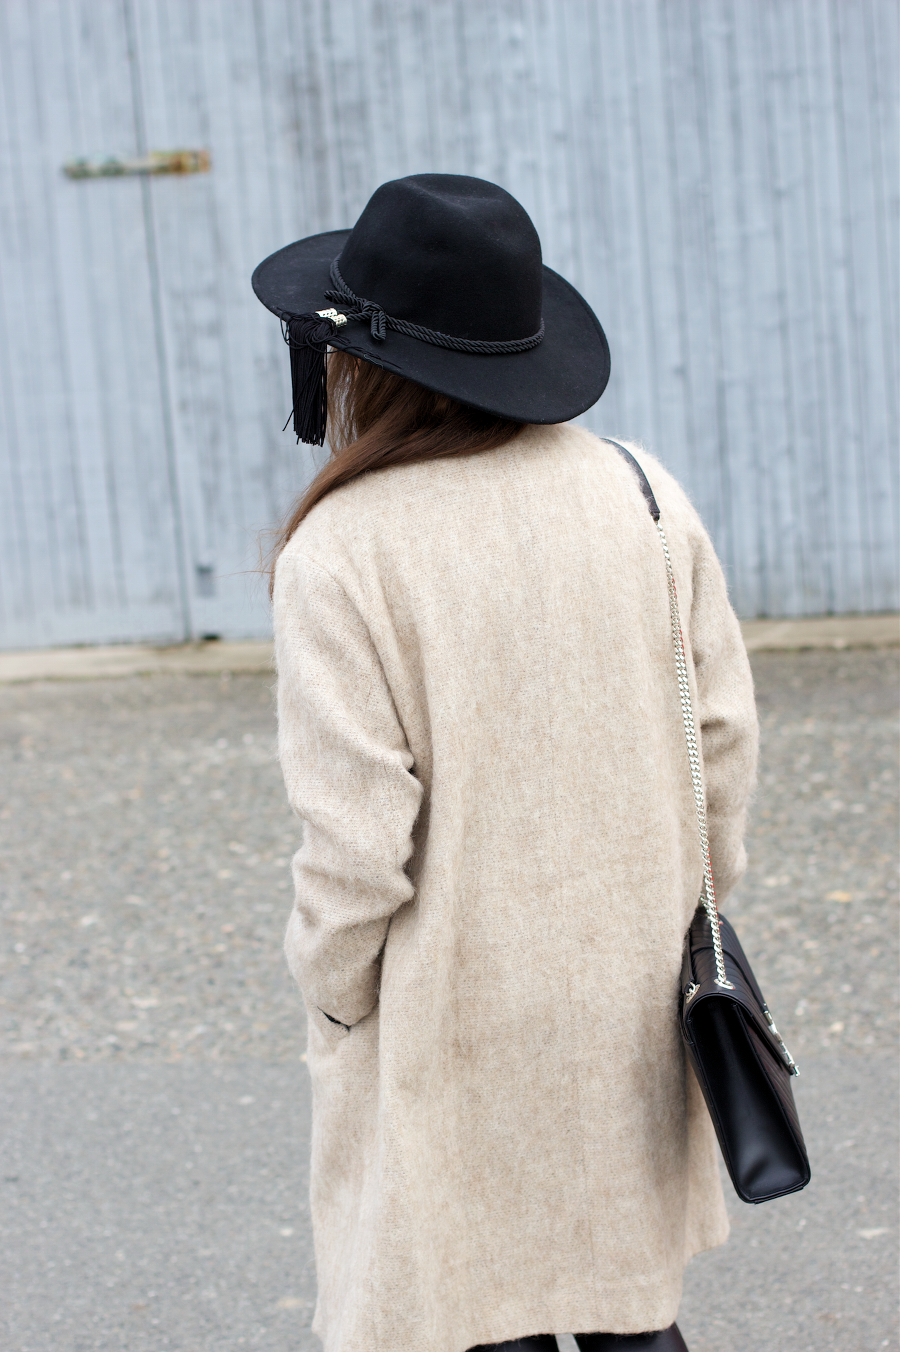 Asos Camel Coat Black Hat YSL